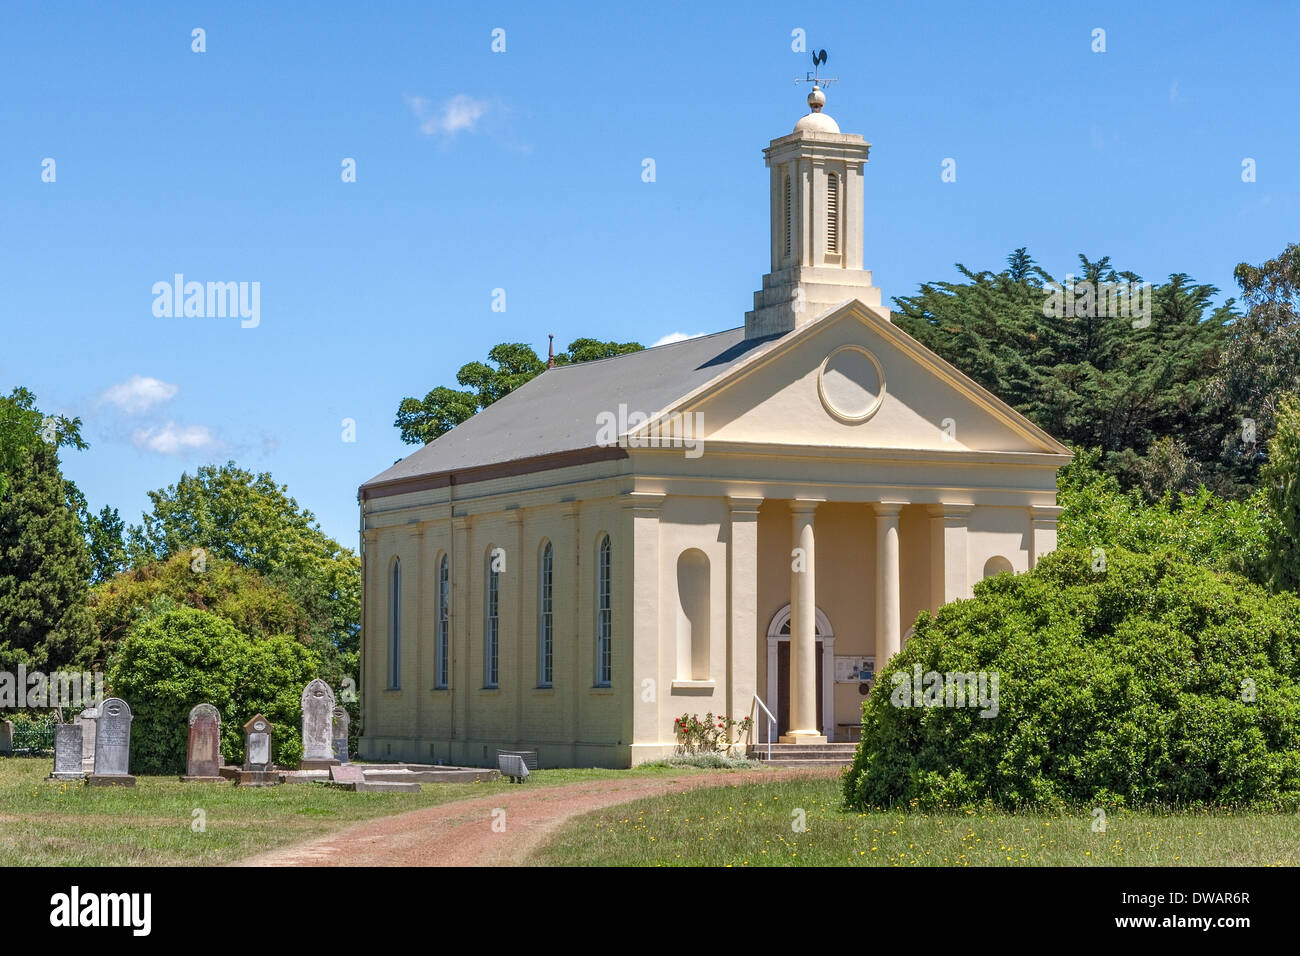 St Andrews Uniting Church Historic Evendale town Tasmania Australia - Stock Image